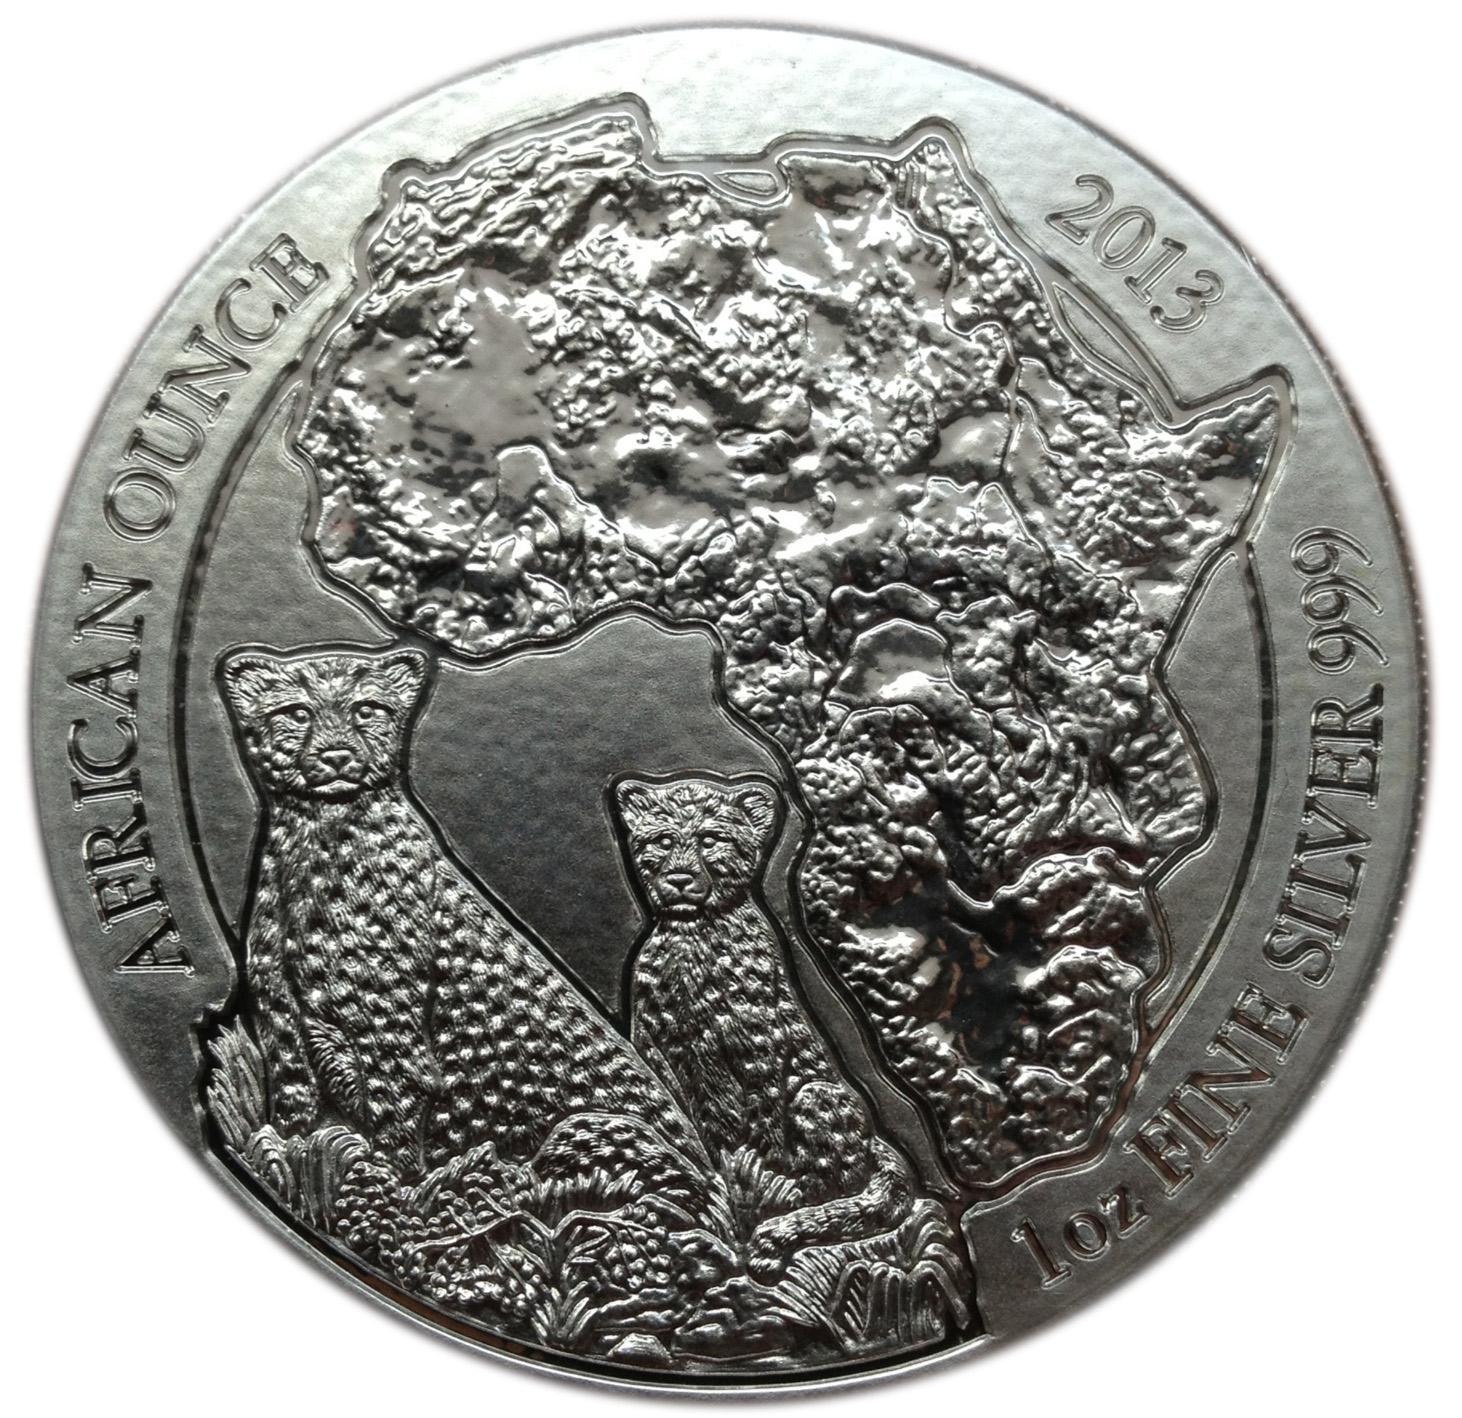 2013 Rwanda Cheetah 50 Francs 1 Oz Coin .999 Silver Map of Africa Mint Blister